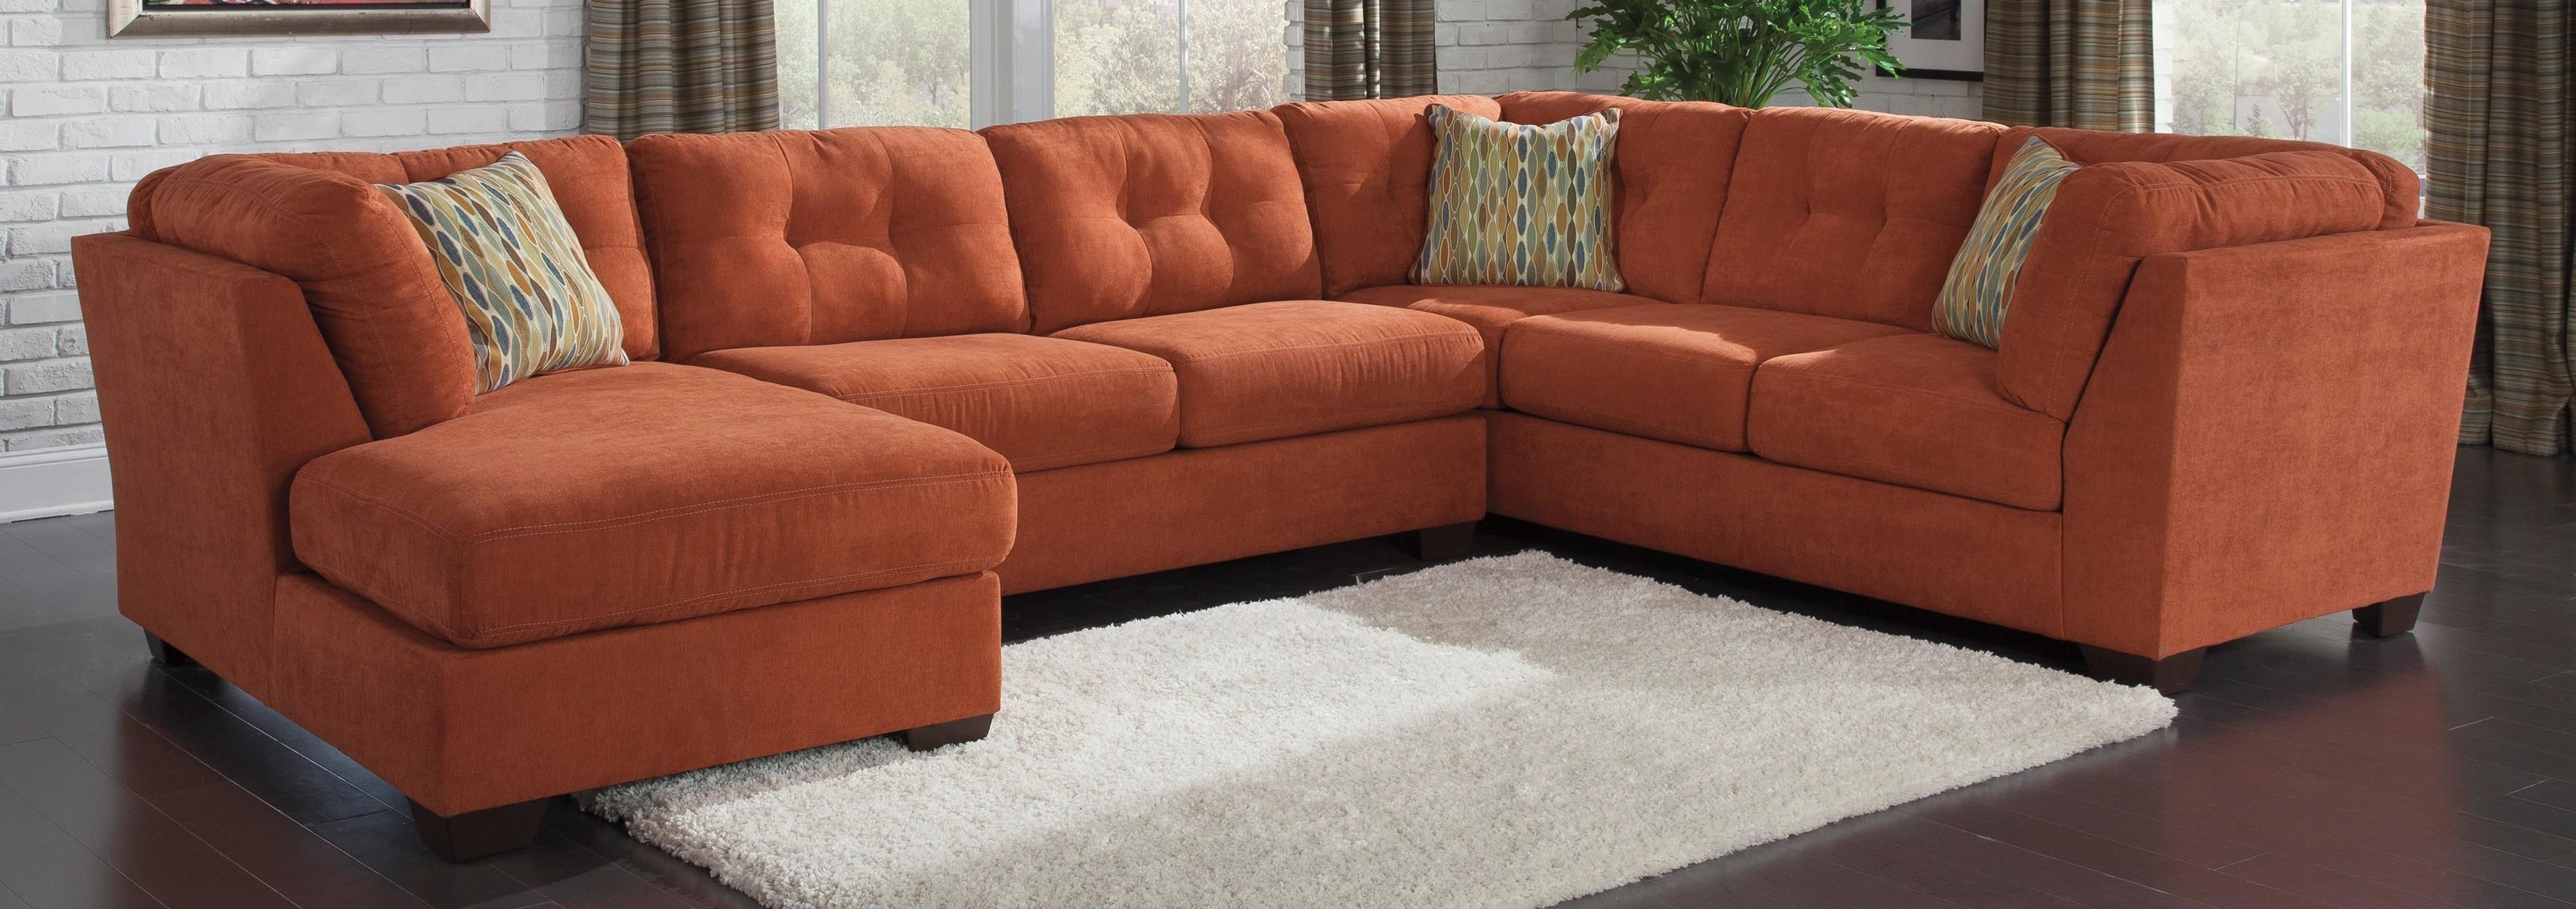 Sofas Center : Orange Sectional Sofa Edra Striking Photos Ideas Regarding Orange Sectional Sofas (View 12 of 20)